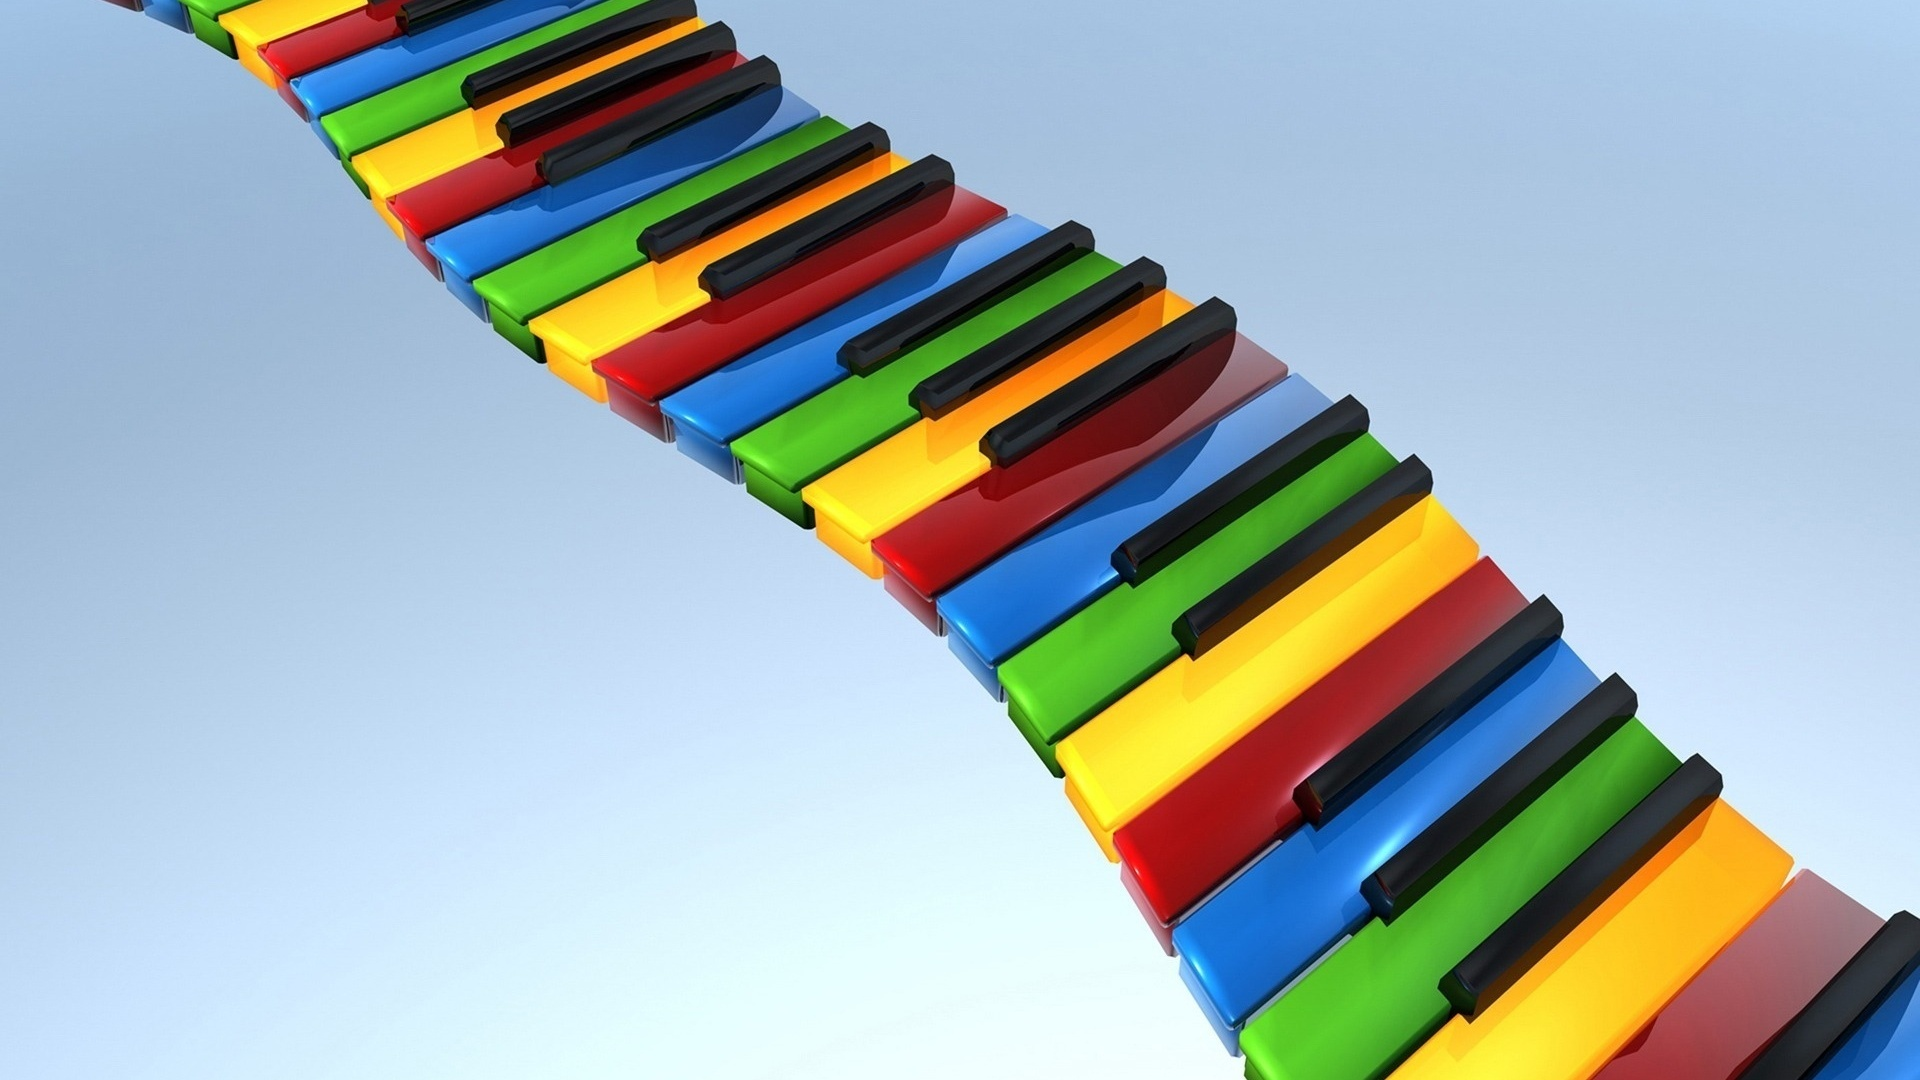 Rainbow Key Tuts - Rainbow Key Tuts